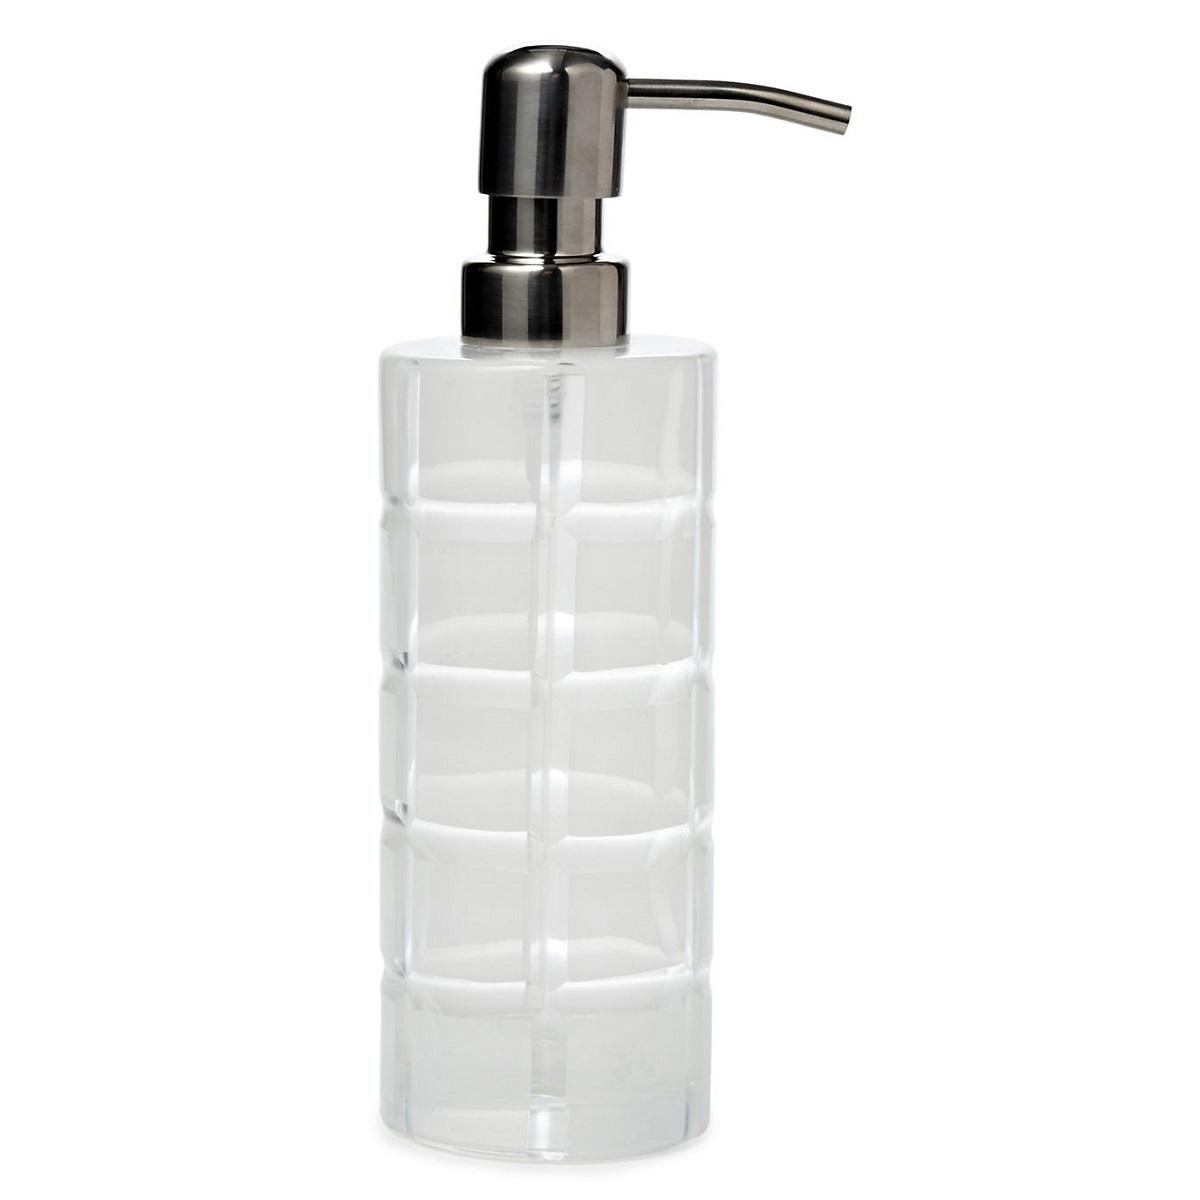 Дозаторы для мыла Дозатор для жидкого мыла Hammam Spa от Kassatex dozator-dlya-zhidkogo-mila-hammam-spa-ot-kassatex-ssha-kitay.jpg